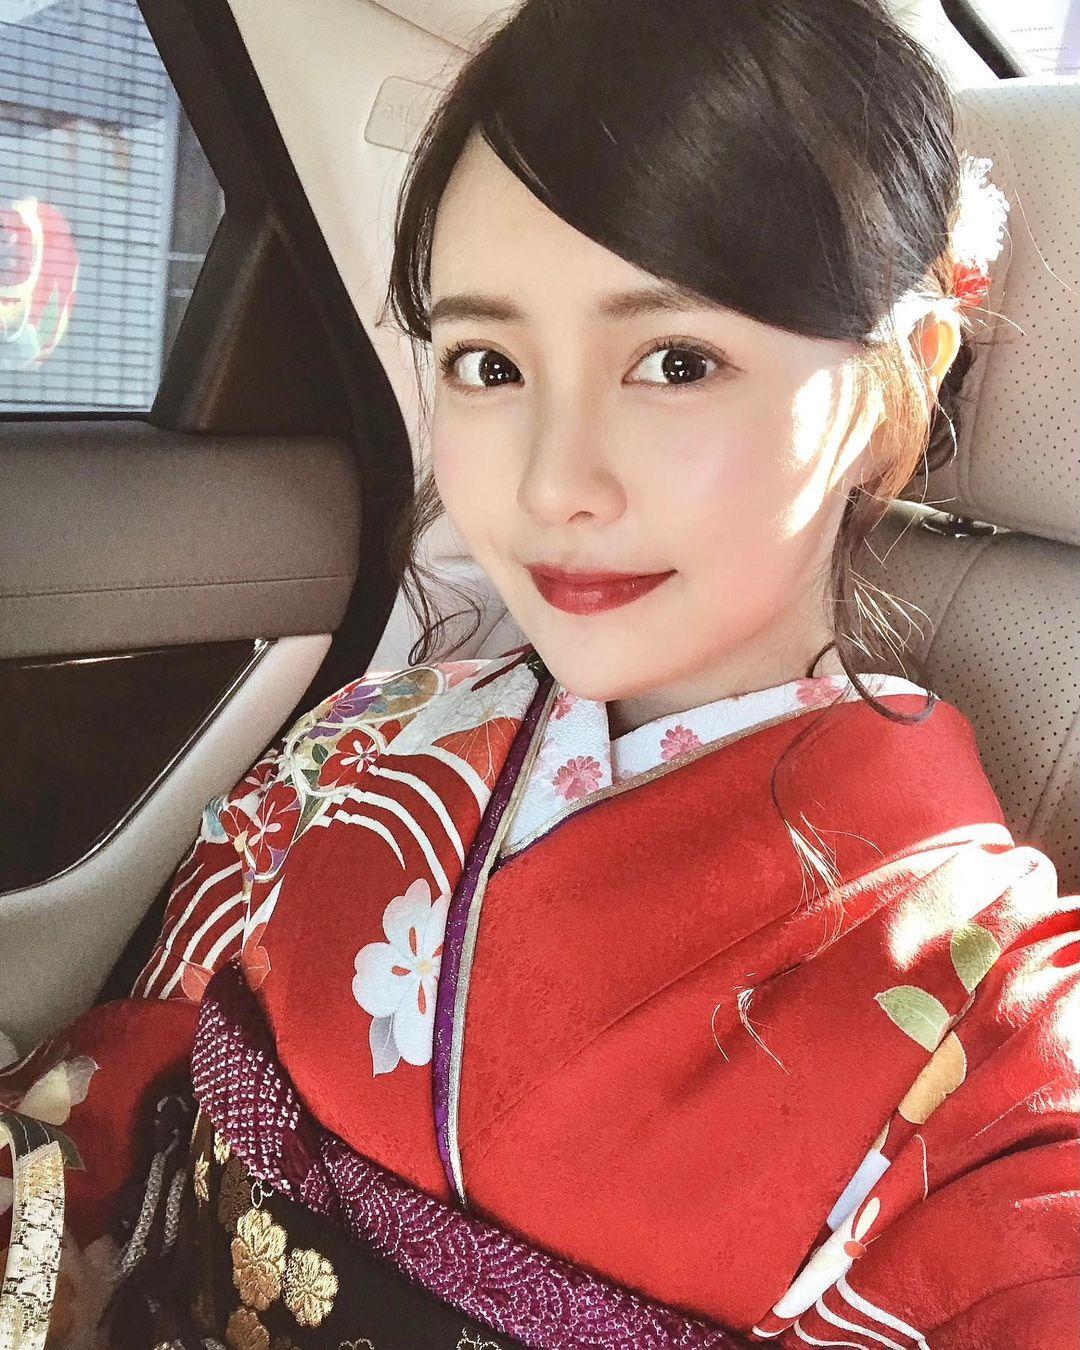 [日本]选美比赛亚军.新田さちか甜美外型深受喜爱 网络美女 第4张